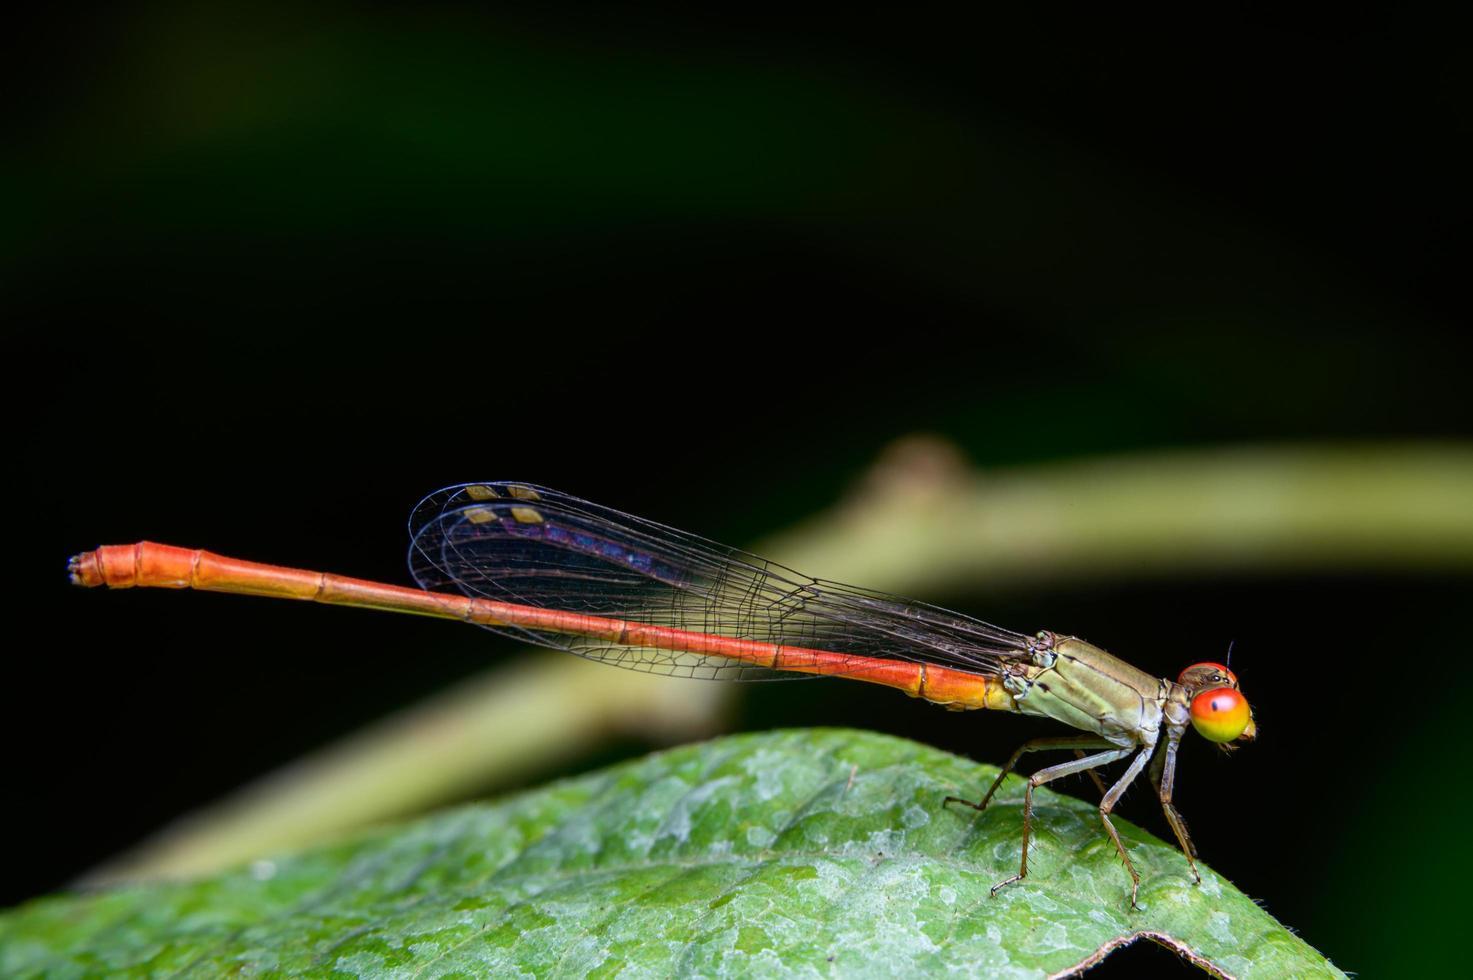 Agriocnemis oder Libelle auf Blättern foto